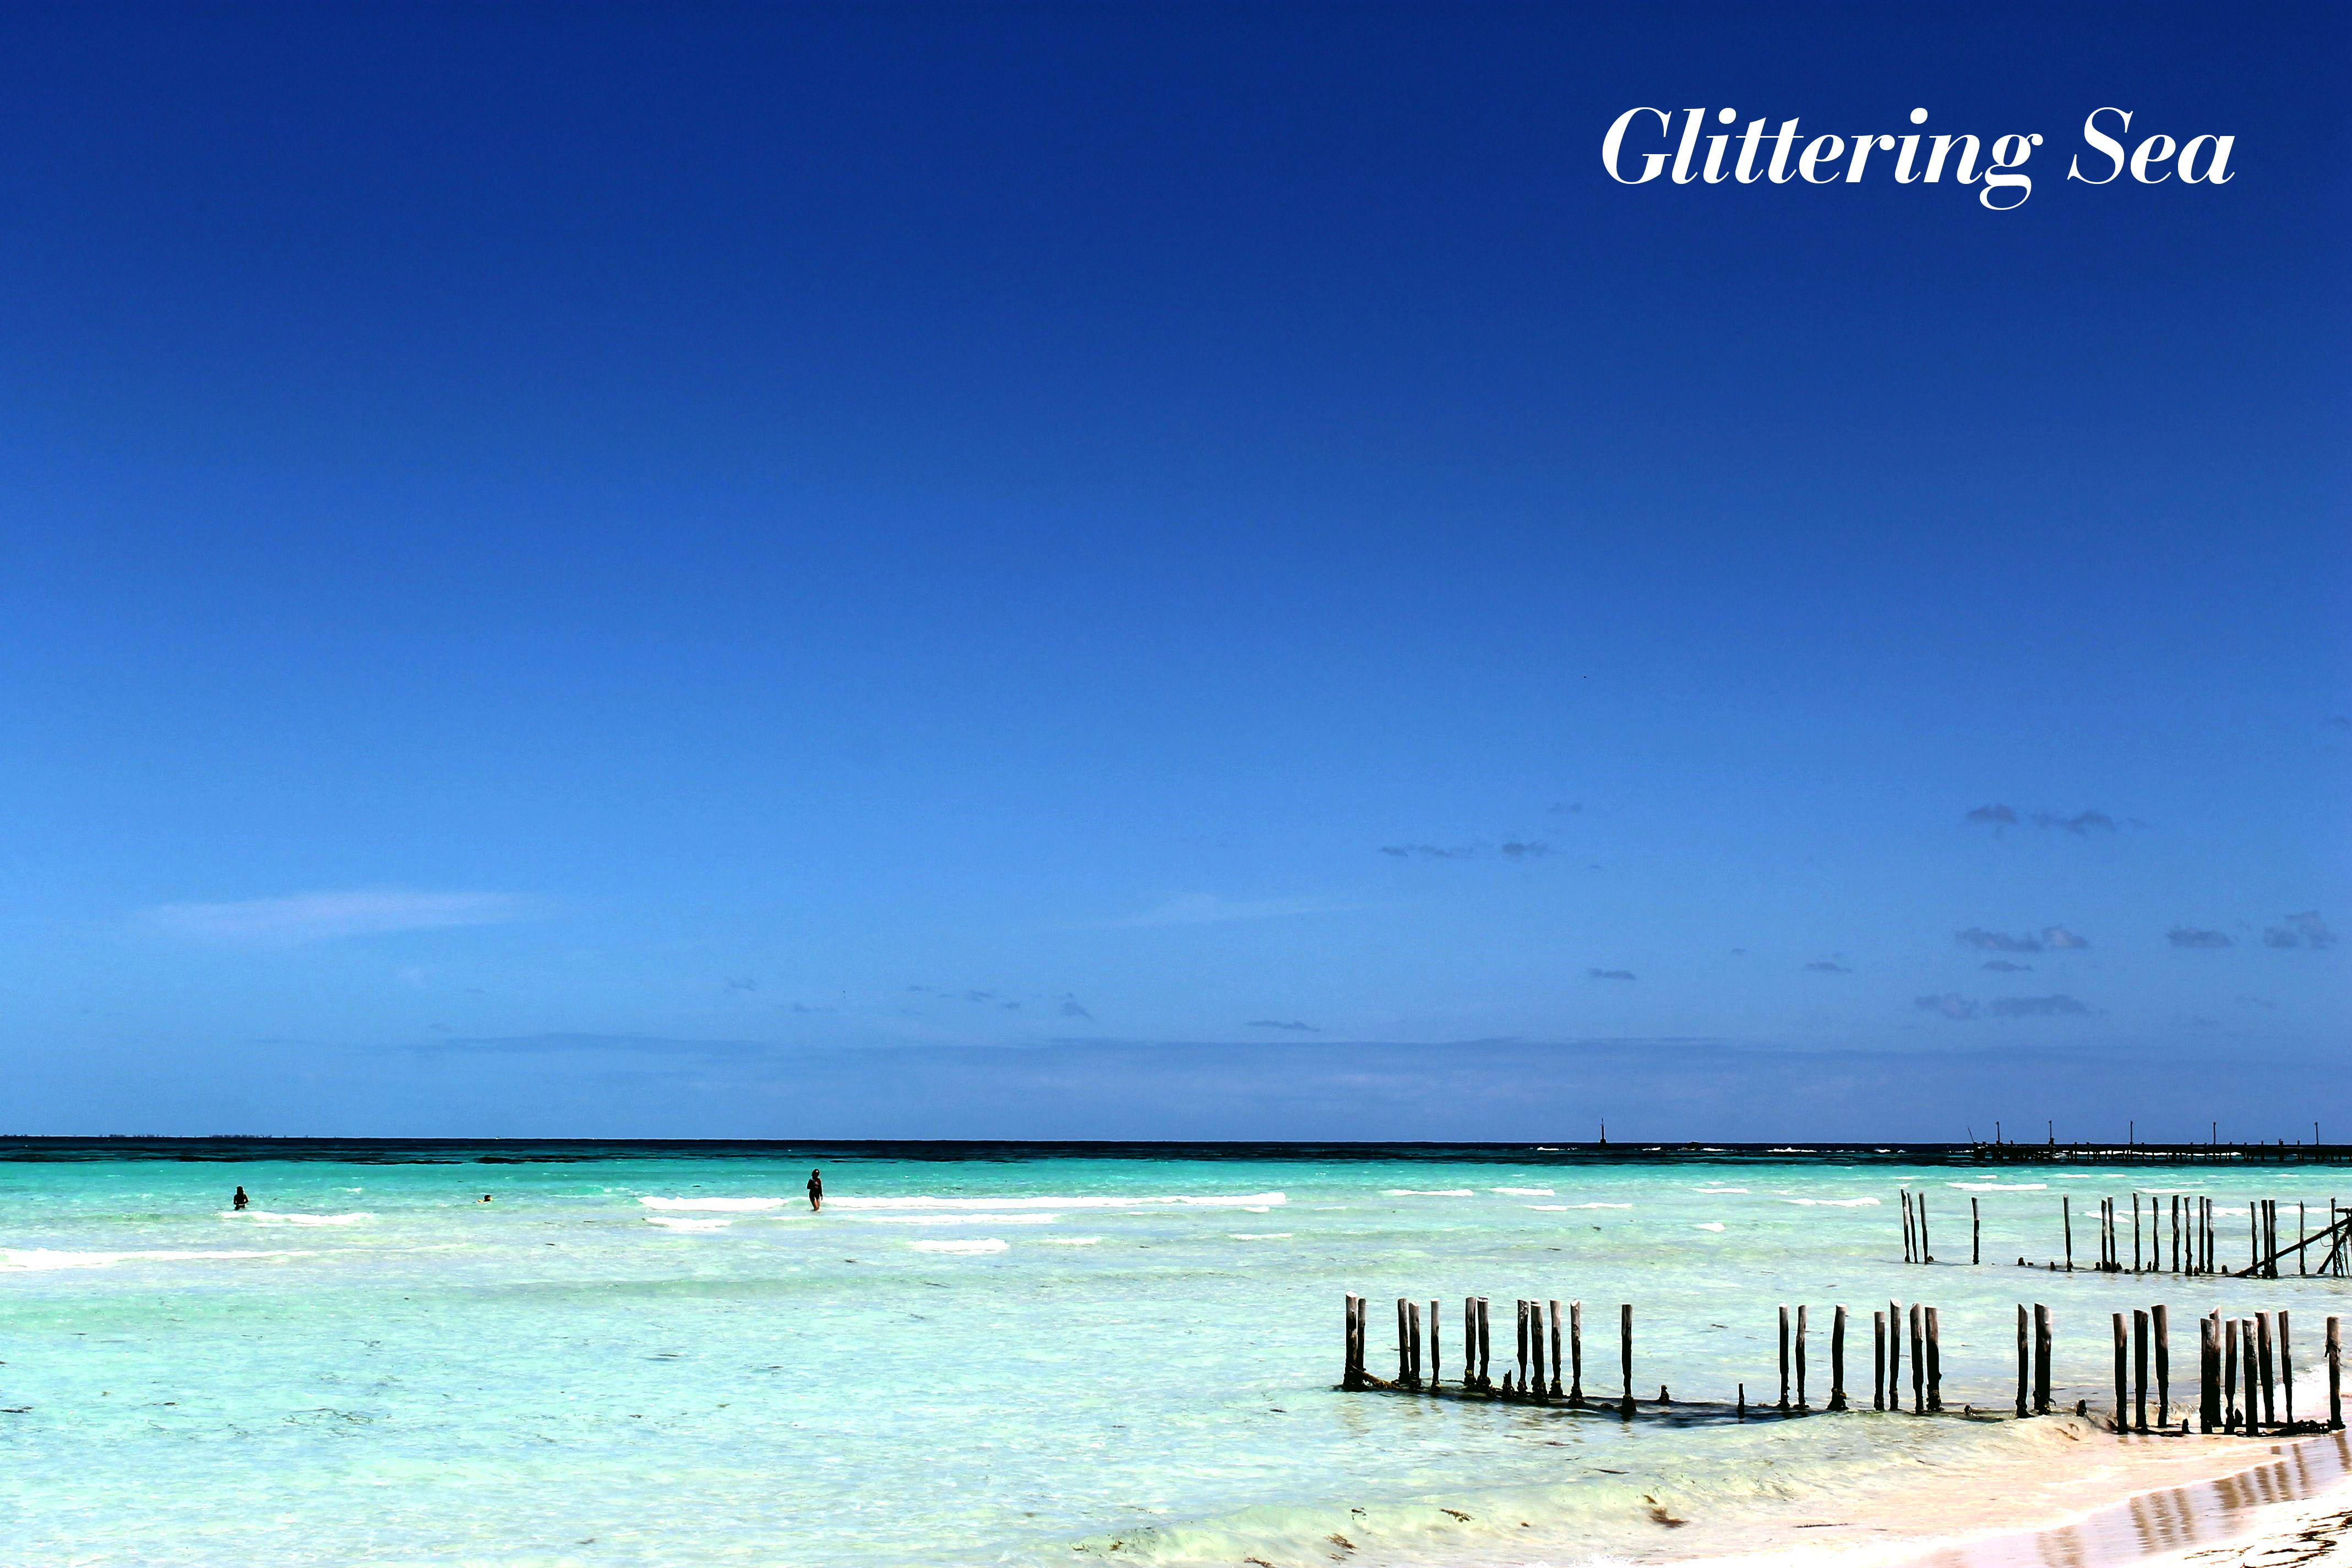 Glittering Sea.JPG